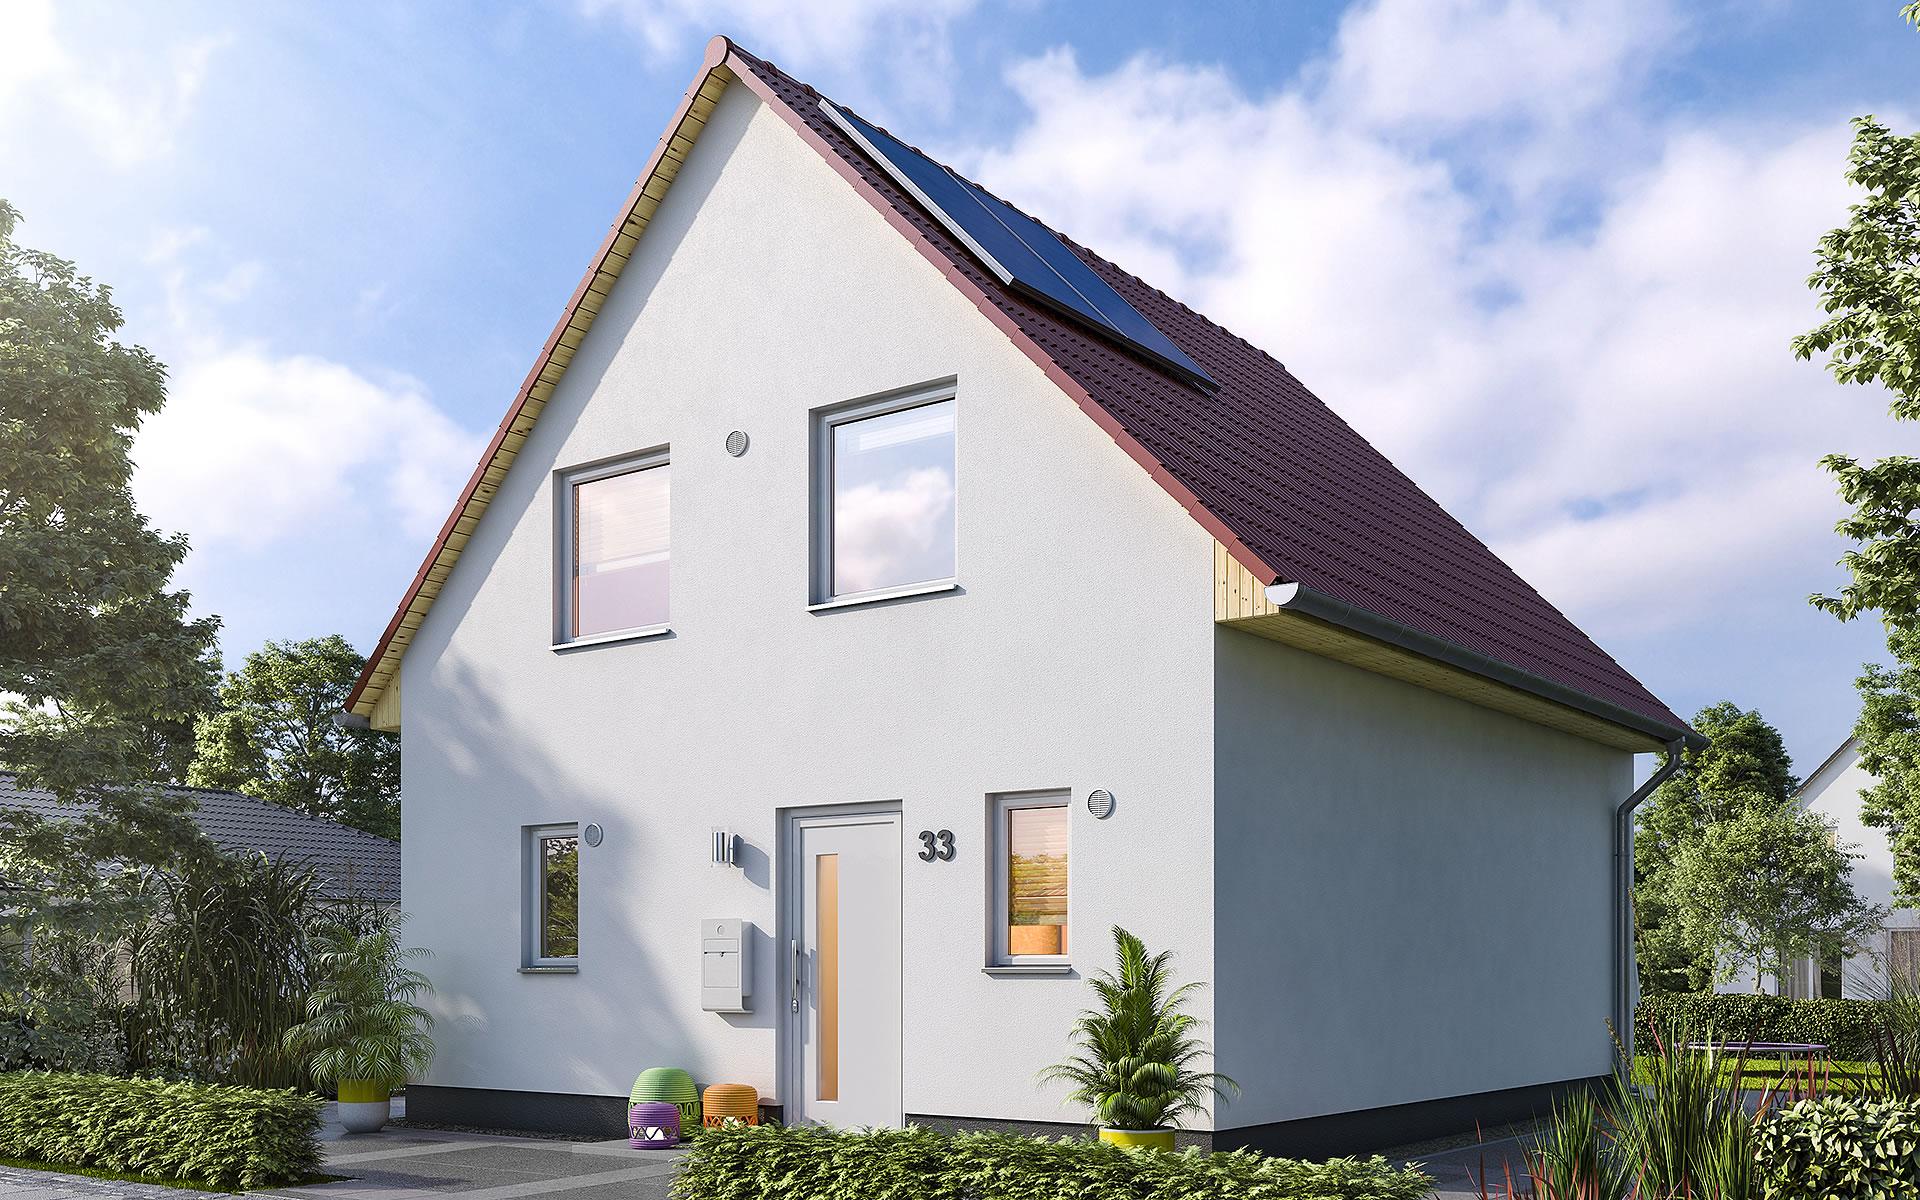 Aktionshaus Aspekt 90 - Town & Country Haus Lizenzgeber GmbH